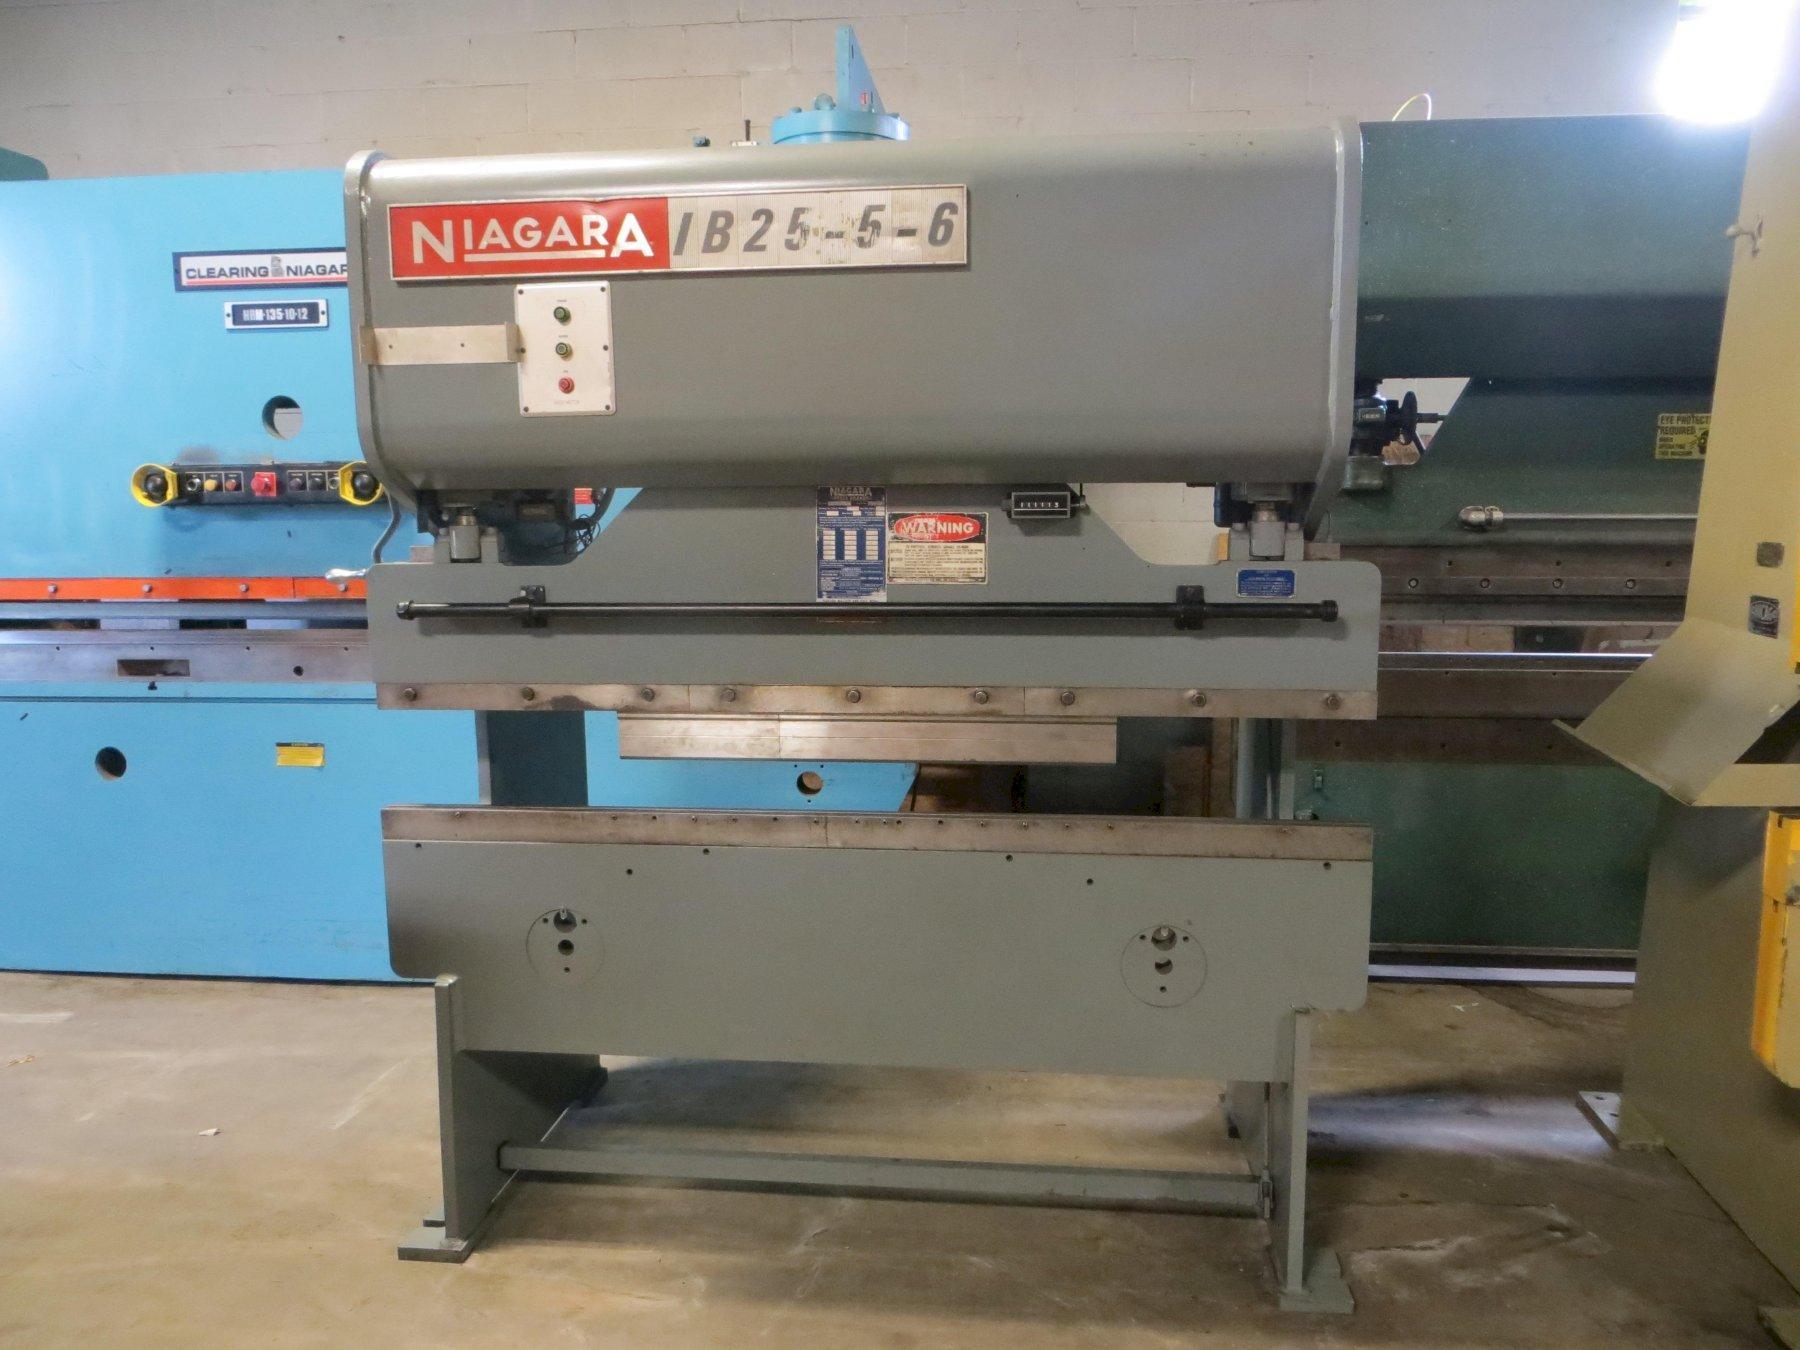 25 Ton x 6 ft. Niagara Mechanical Press Brake Model IB25-5-6